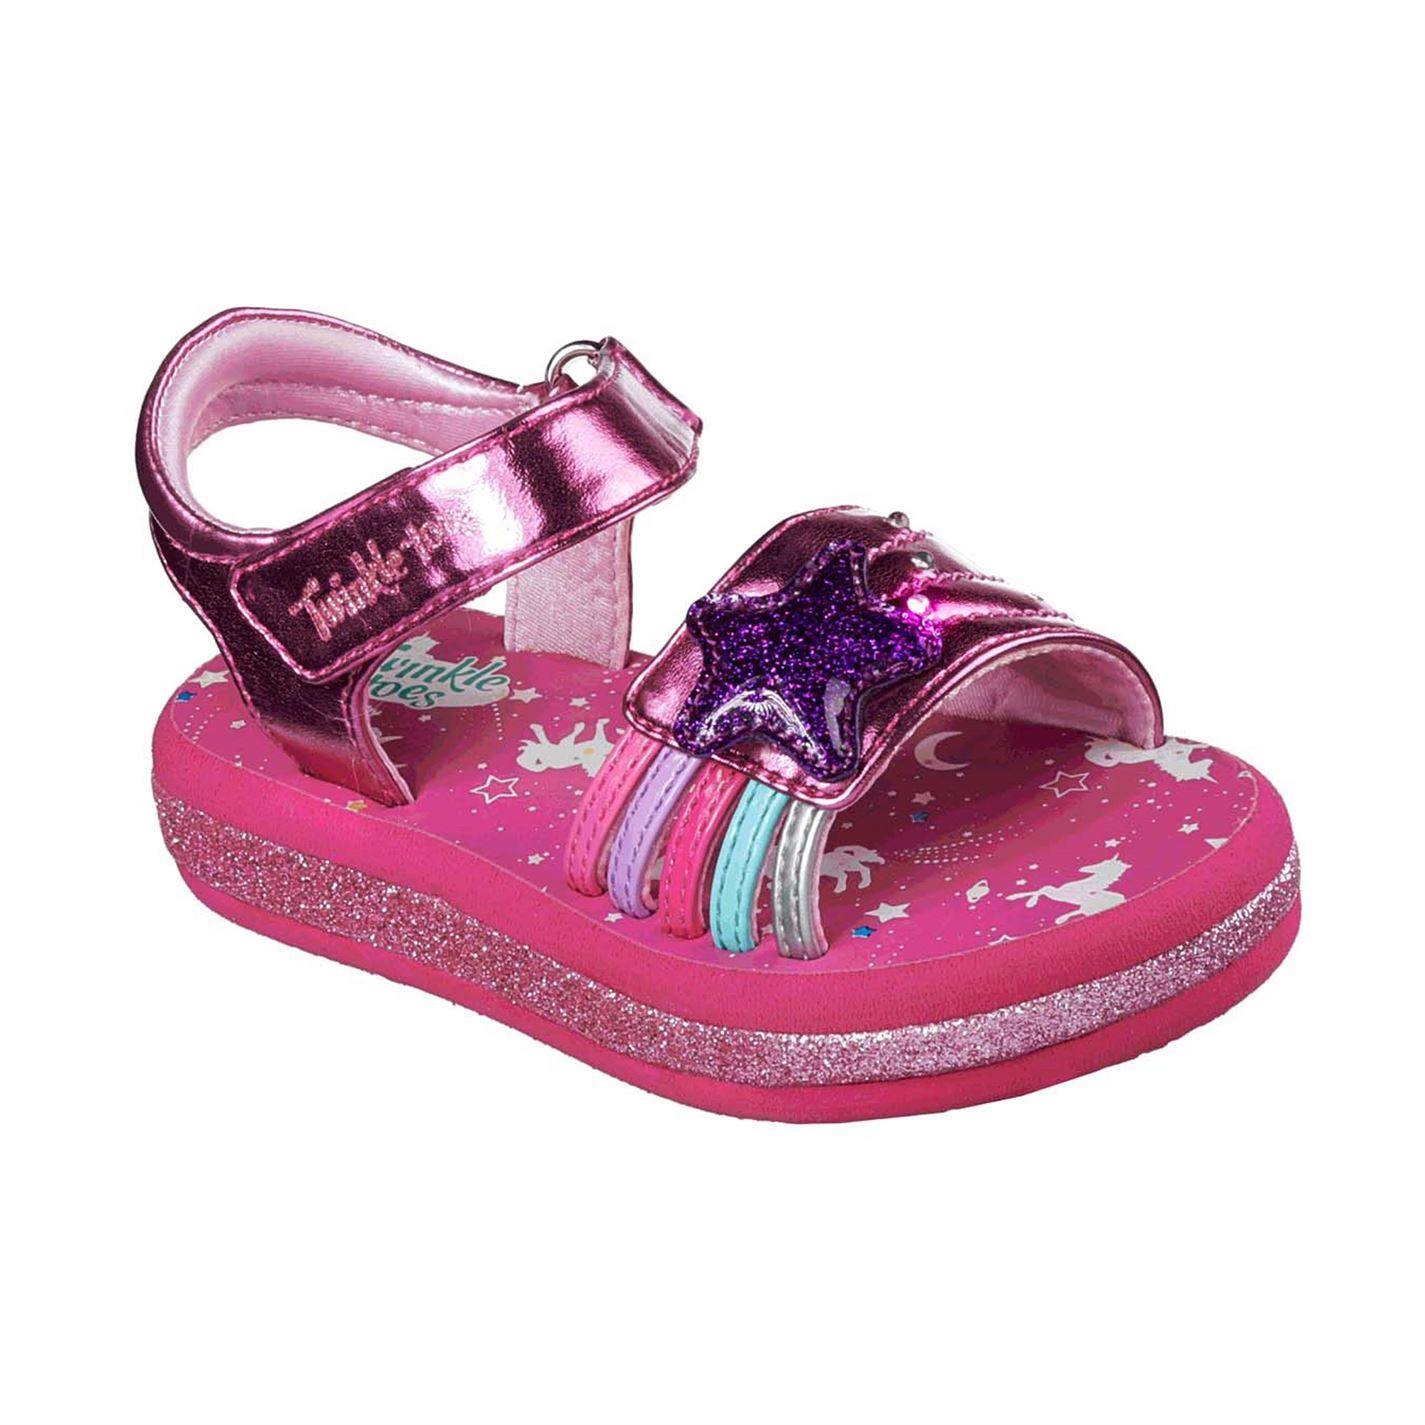 Skechers Toddler Girls Twinkle Toe Sunshine Sandals